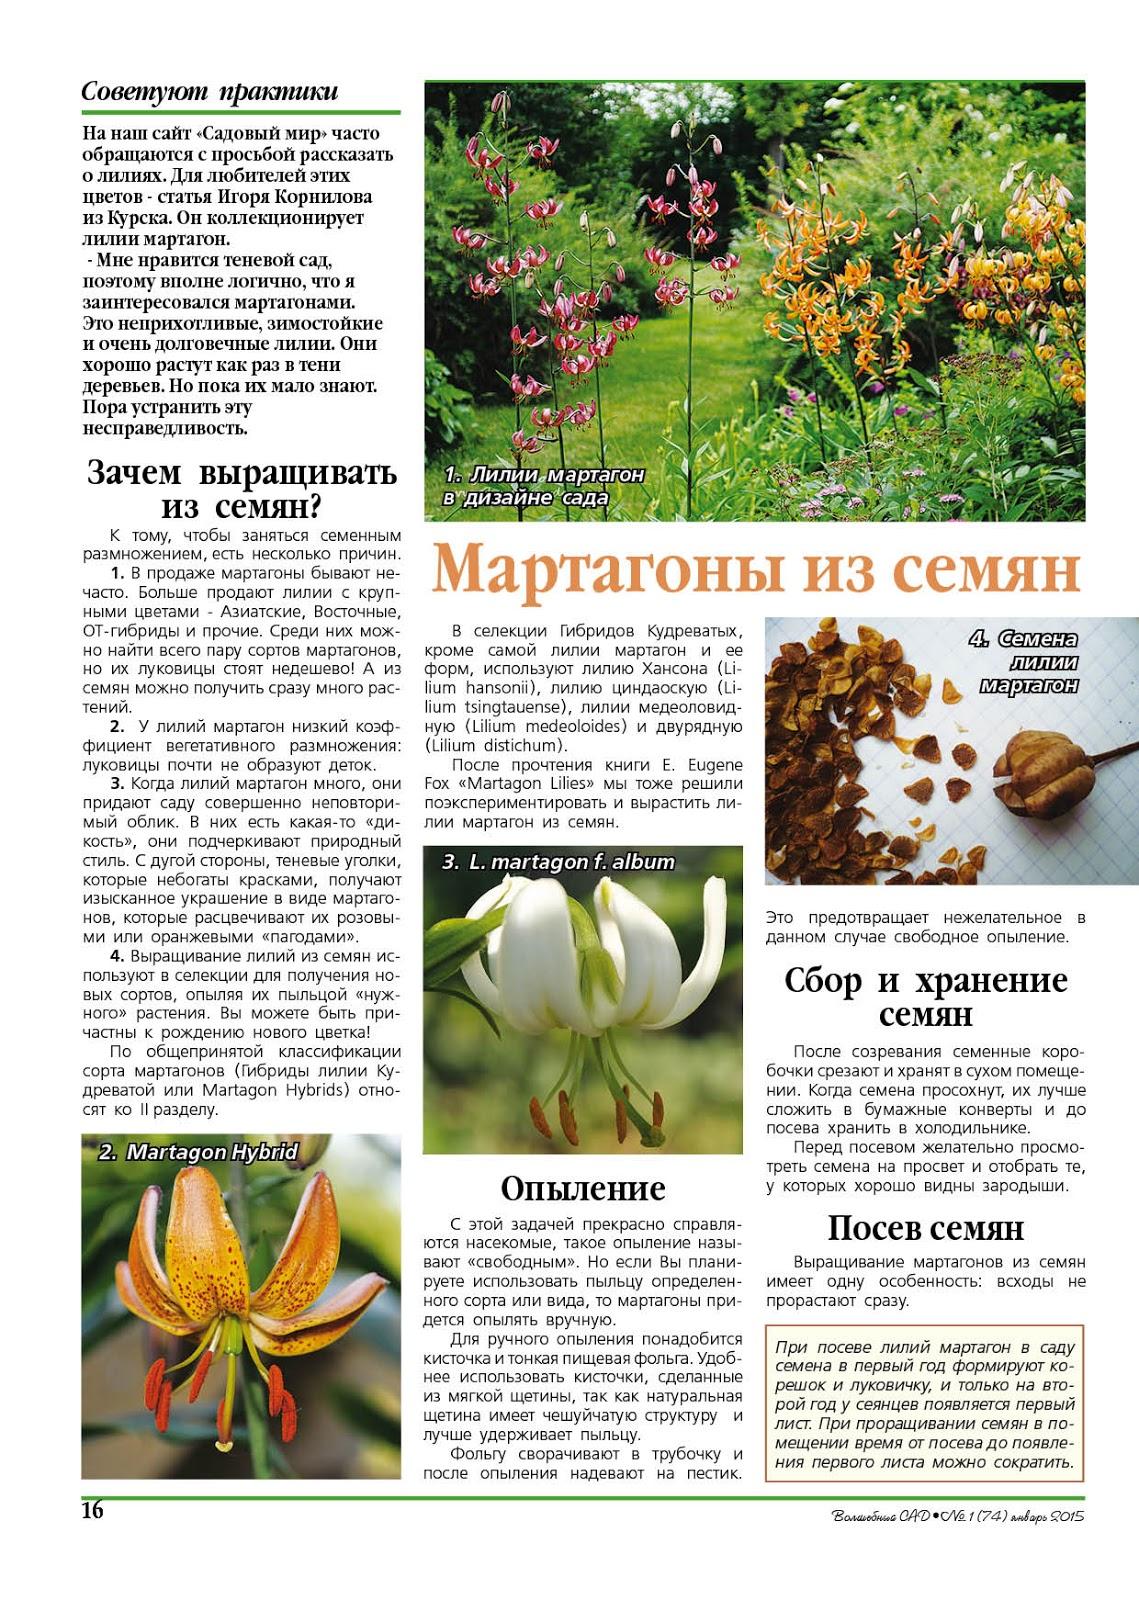 Волшебный сад ● №1 (74) ● Январь 2015 ● Мартагоны из семян